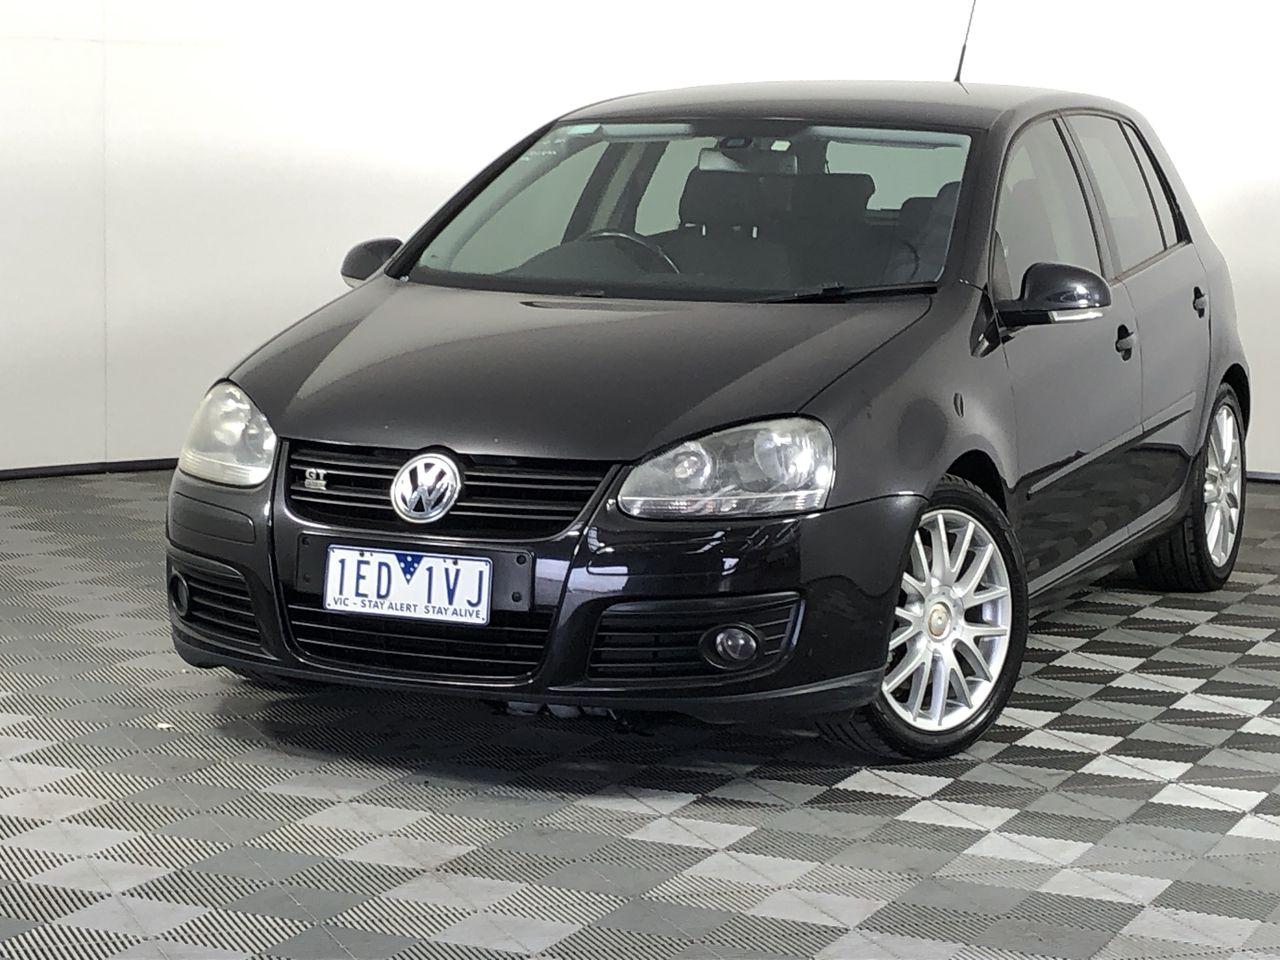 2008 Volkswagen Golf GT SPORT TDI A5 Turbo Diesel Automatic Hatchback